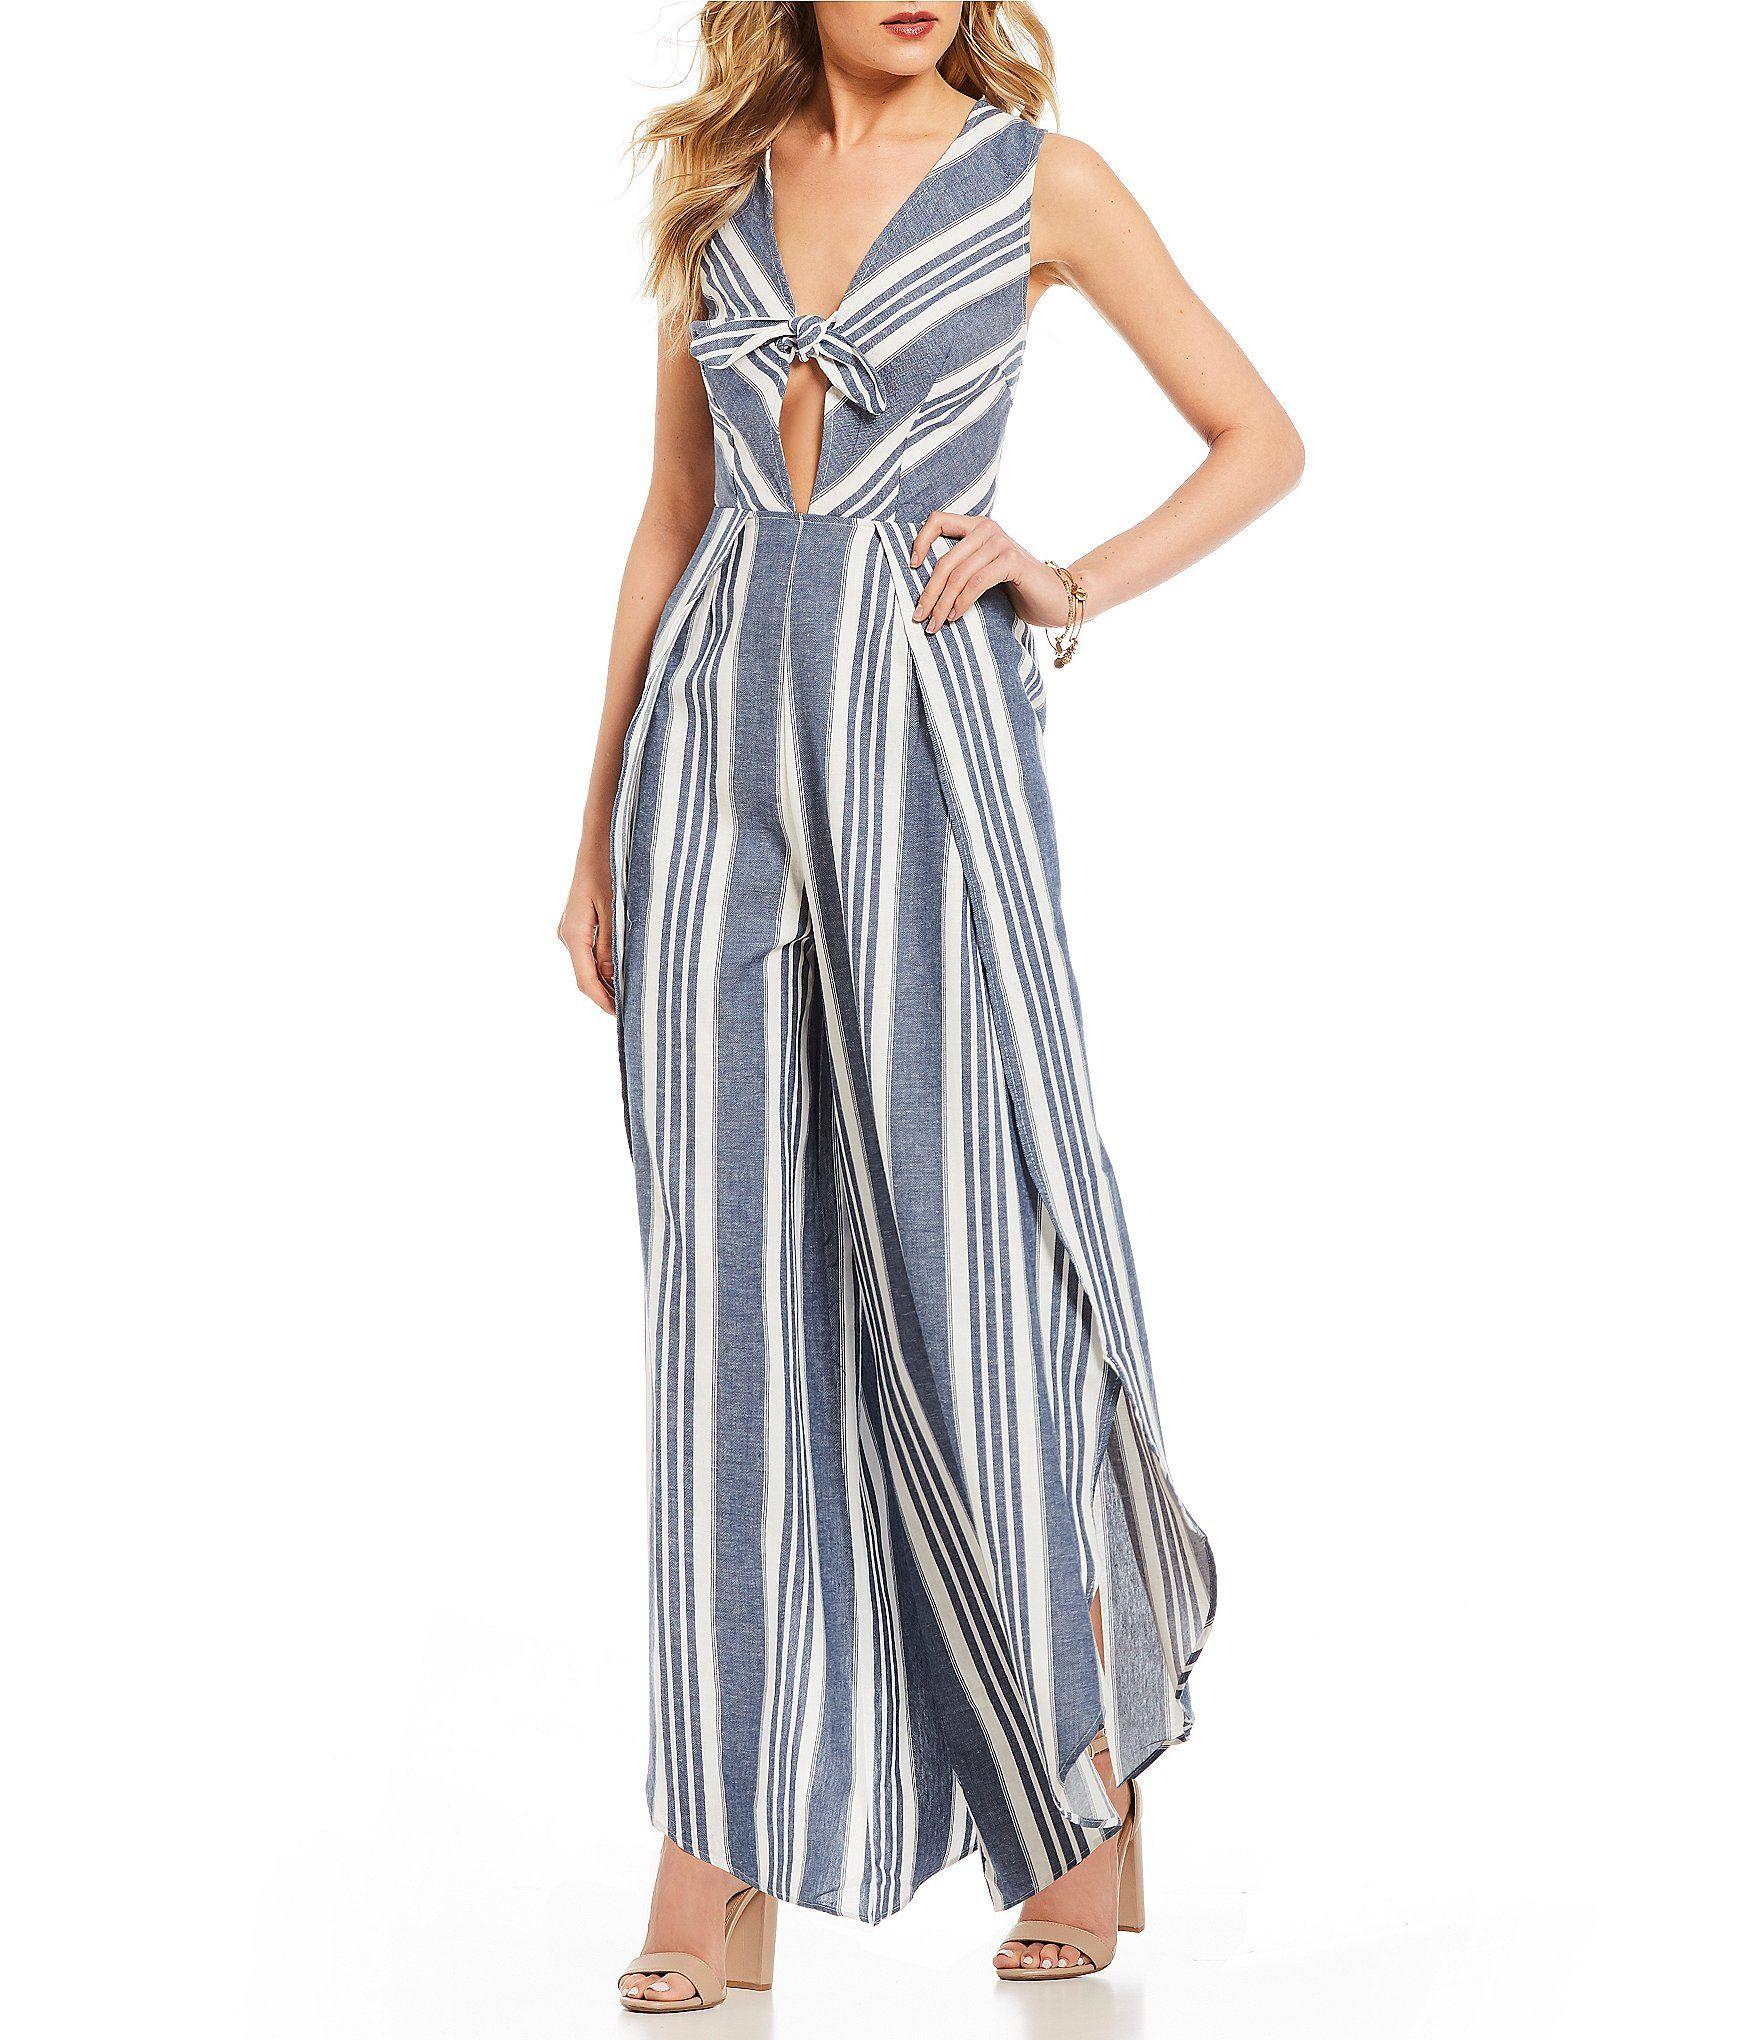 f8f2ec5c400 Shop for Coco + Jaimeson Striped Linen Jumpsuit at Dillards.com. Visit  Dillards.com to find clothing